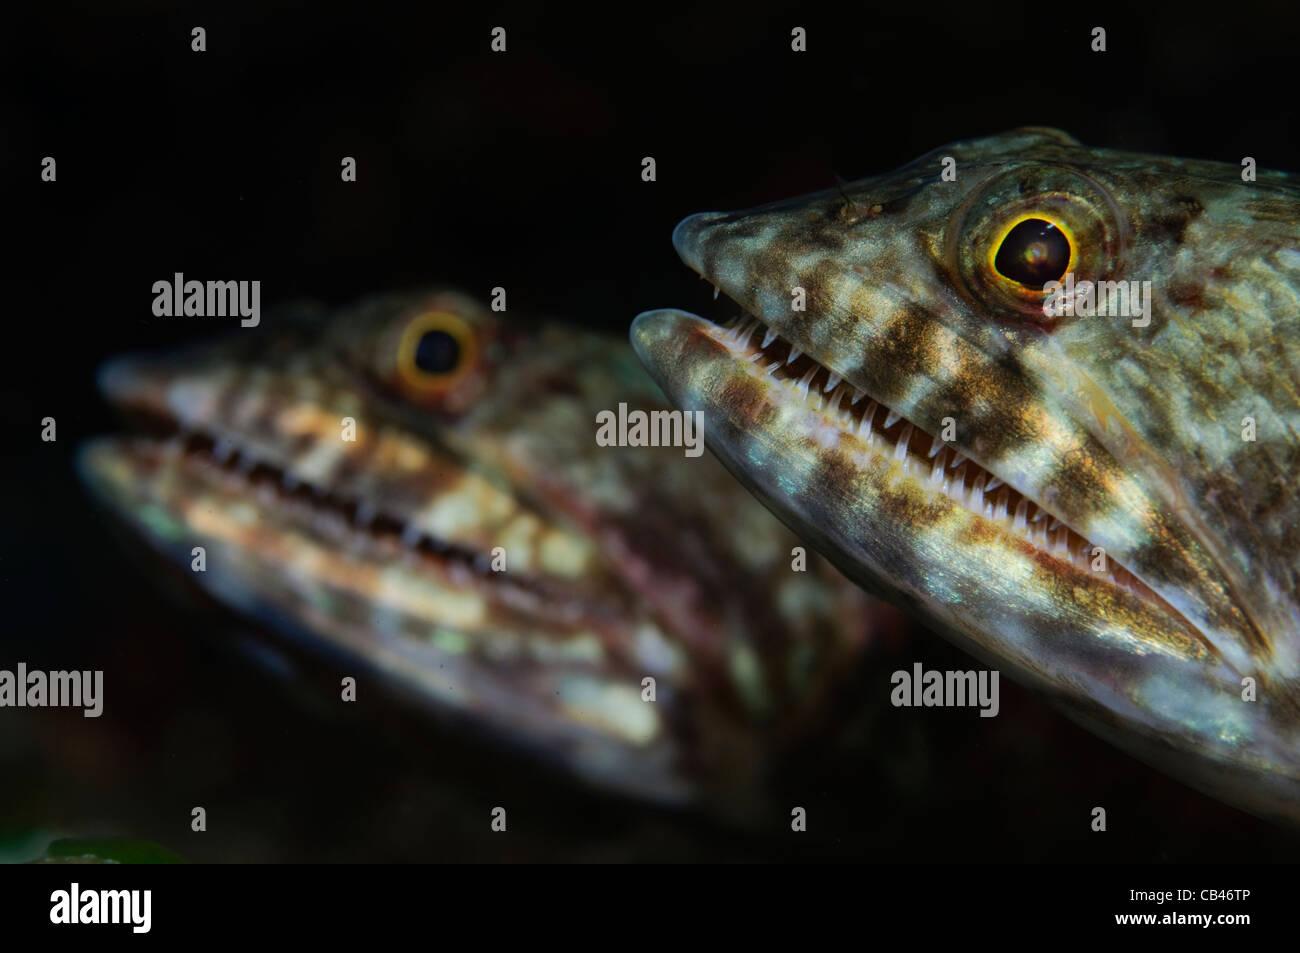 Pair of Lizardfish, Saurida sp., Banda Neira, Banda Sea, eastern Indonesia, Pacific Ocean Stock Photo